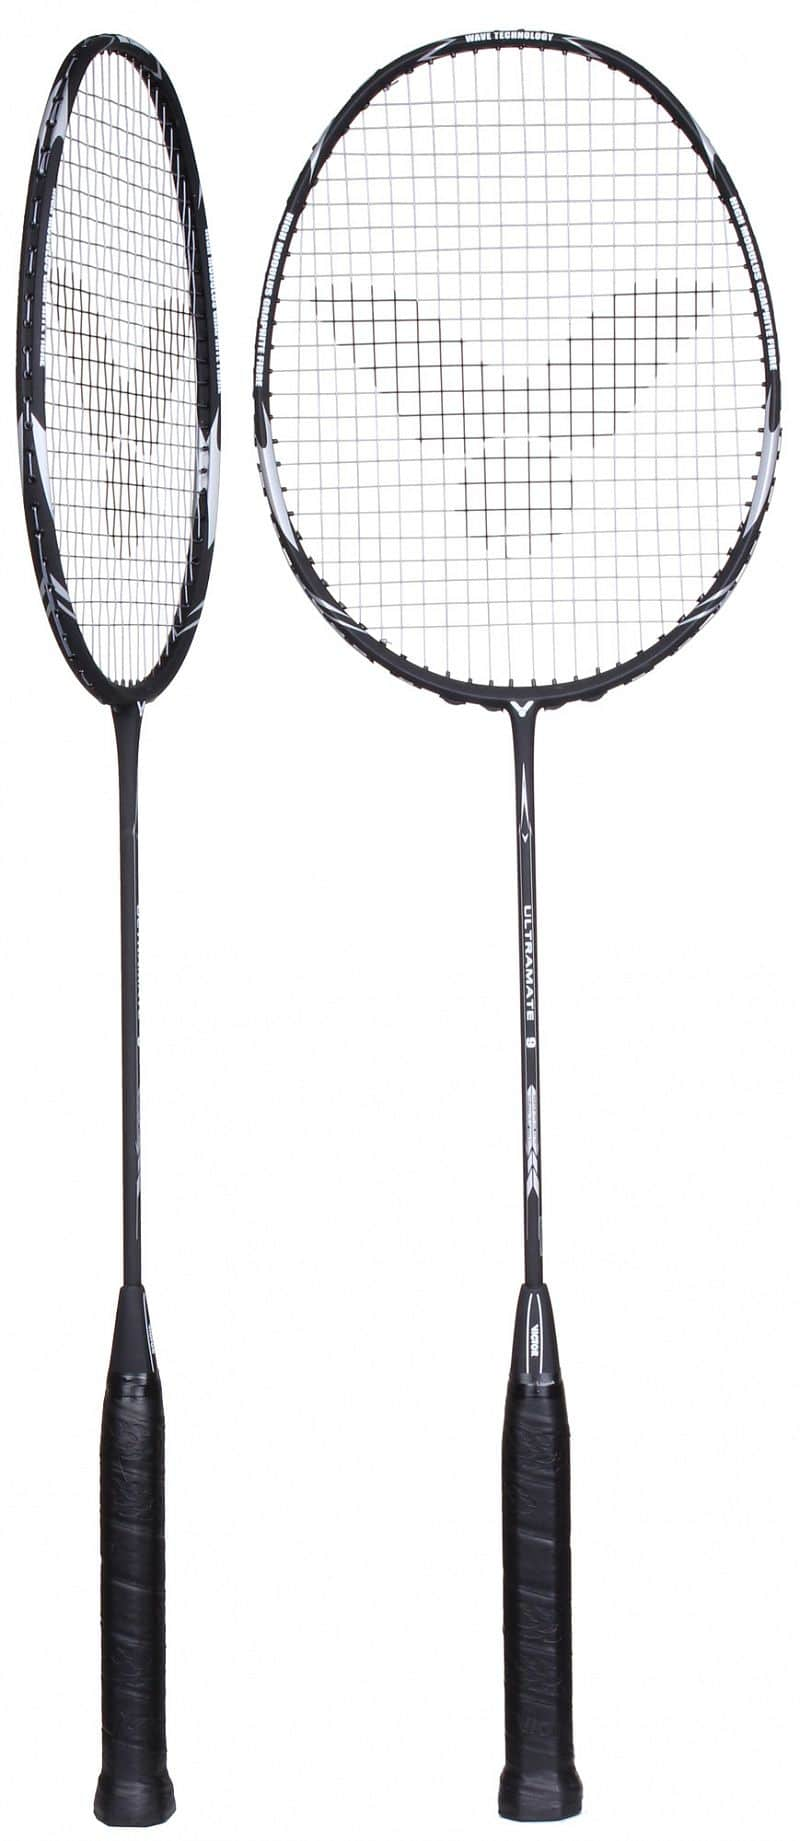 Ultramate 9 badmintonová raketa